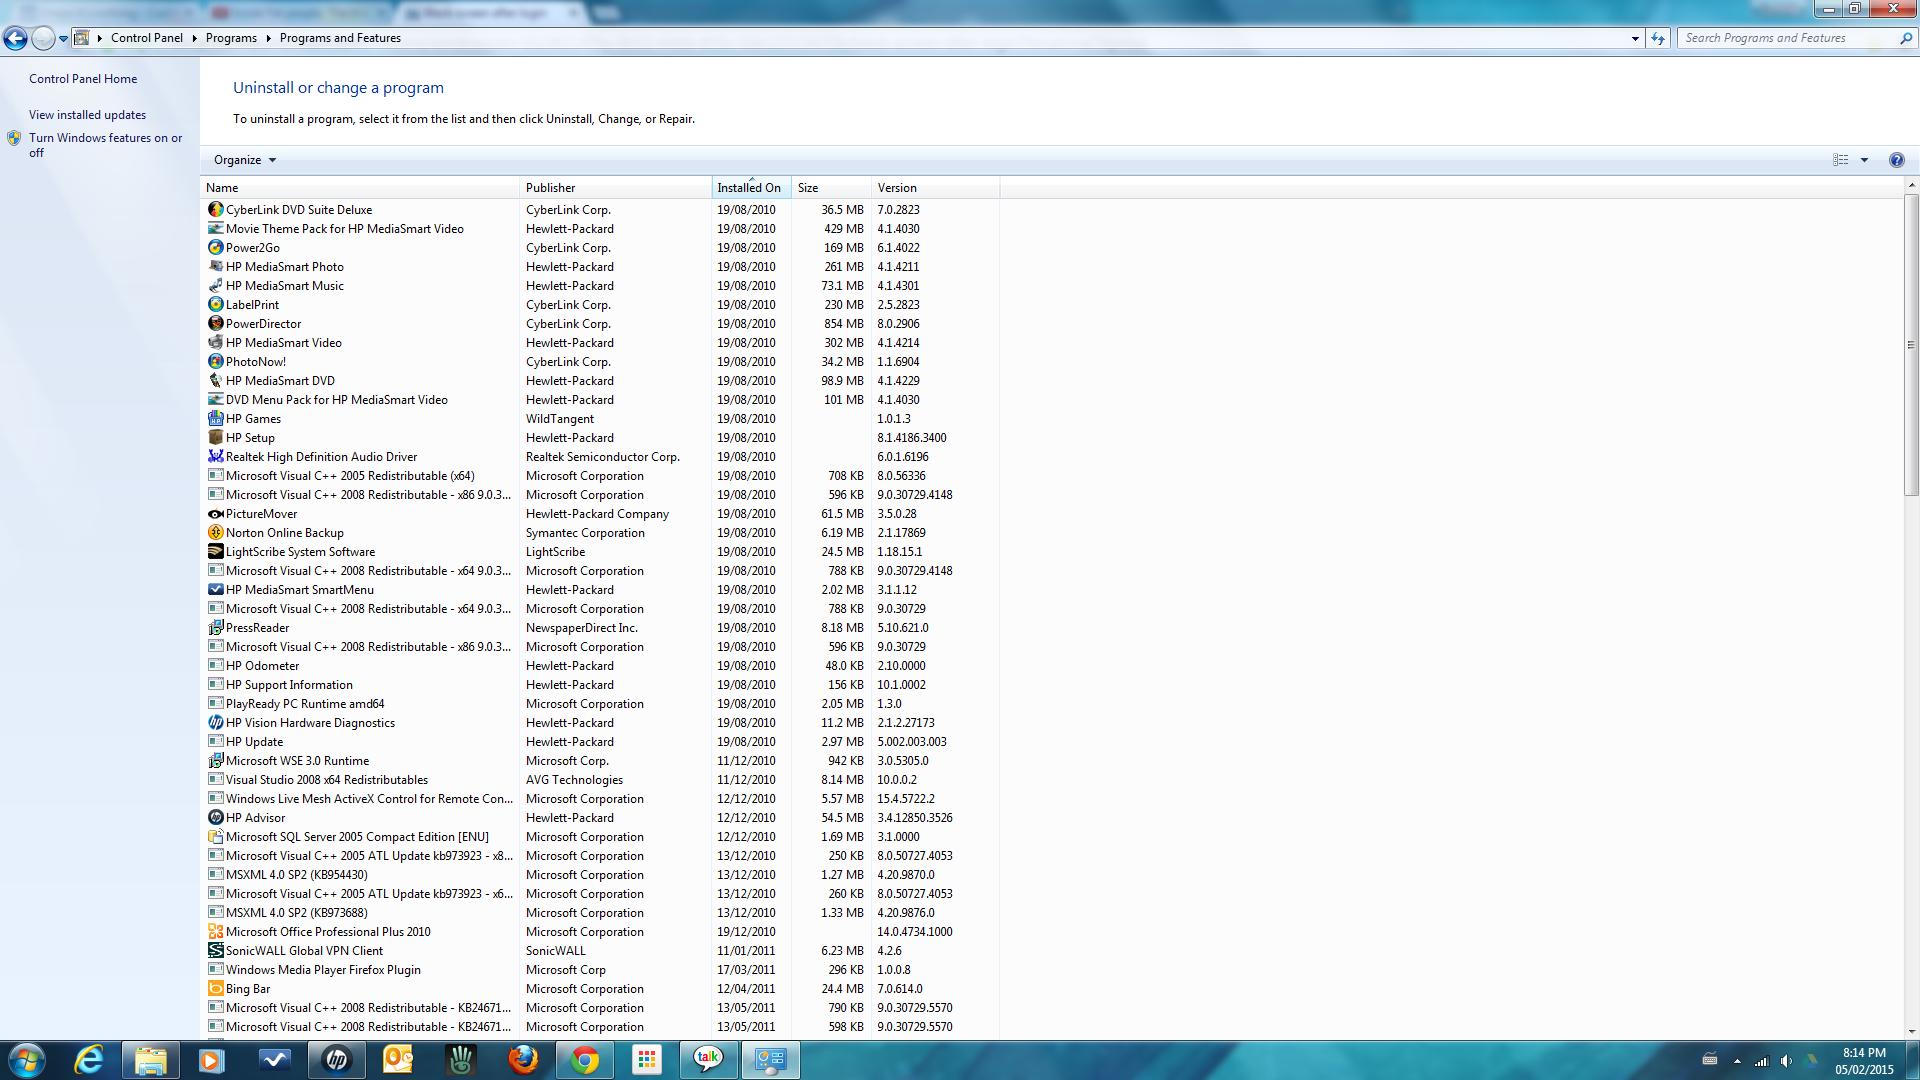 List of installed programs - earliest first.